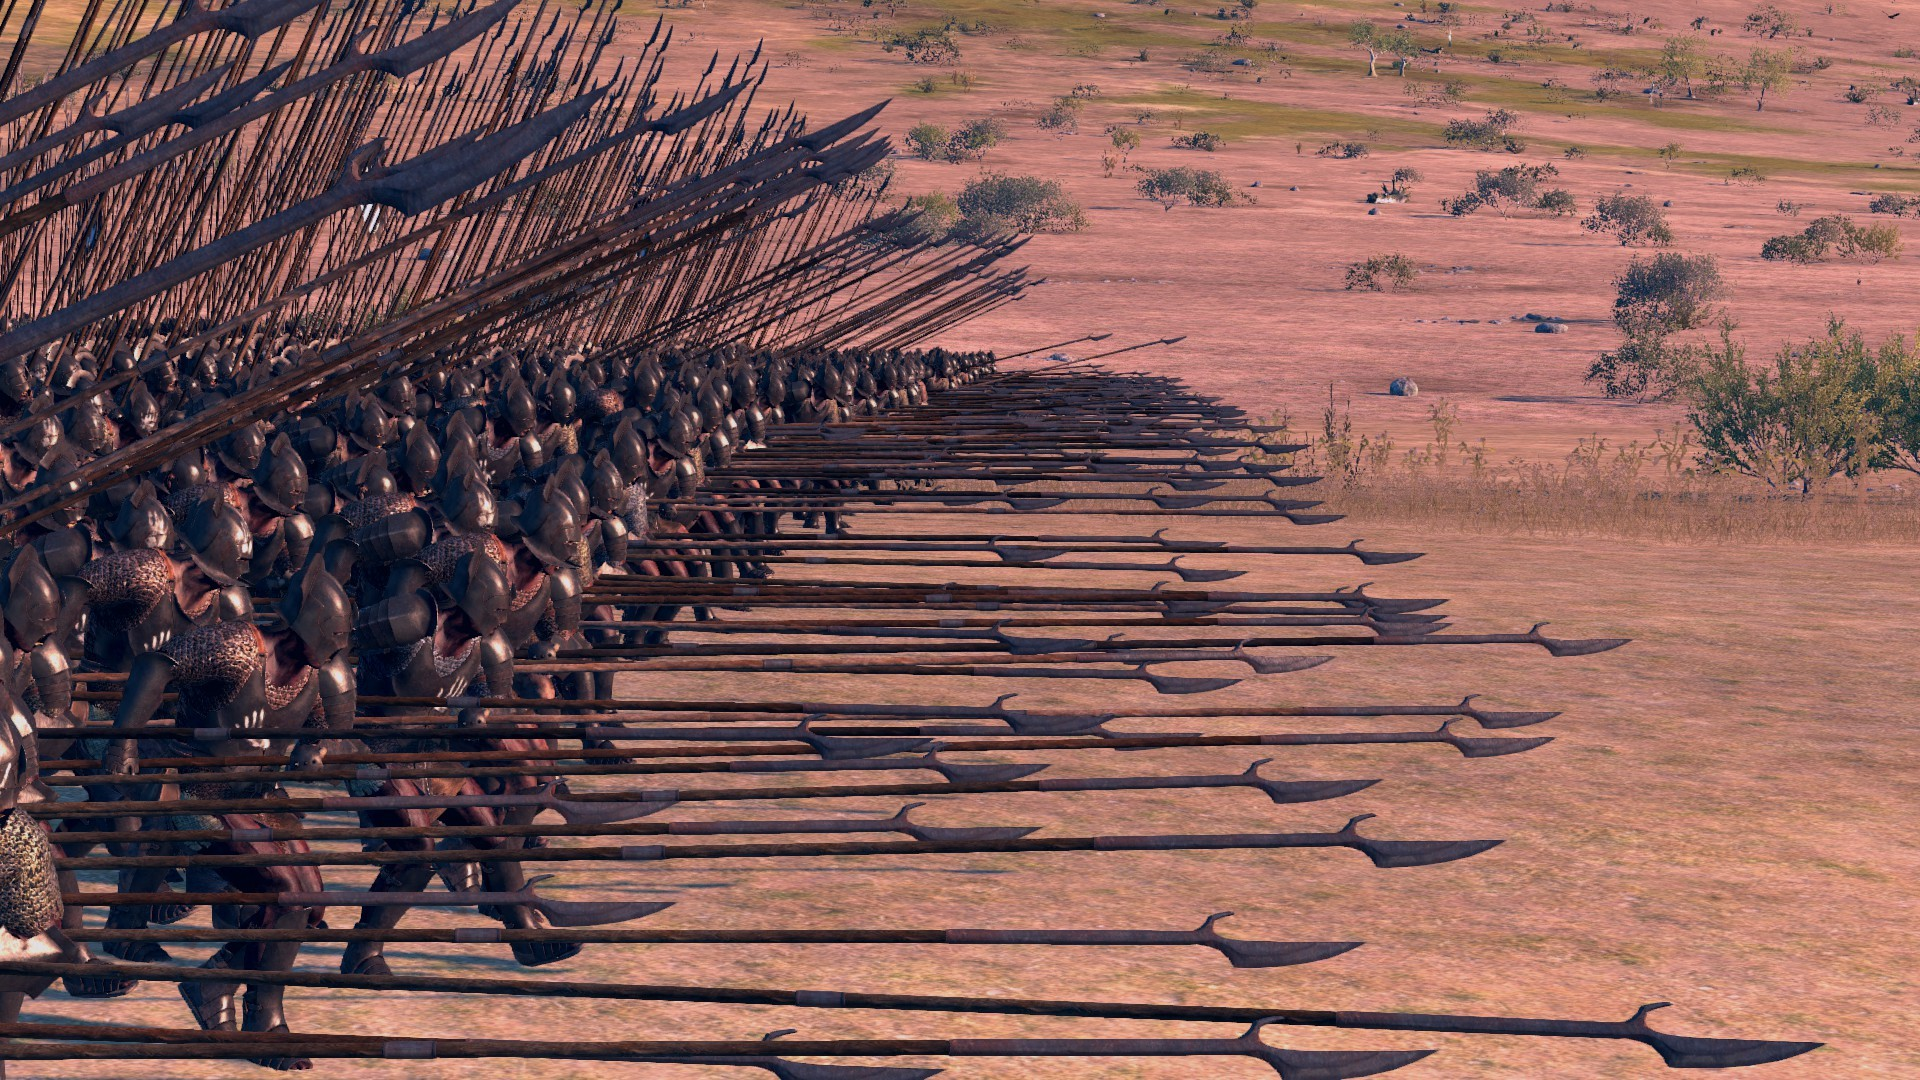 Pike wall (Ingame)